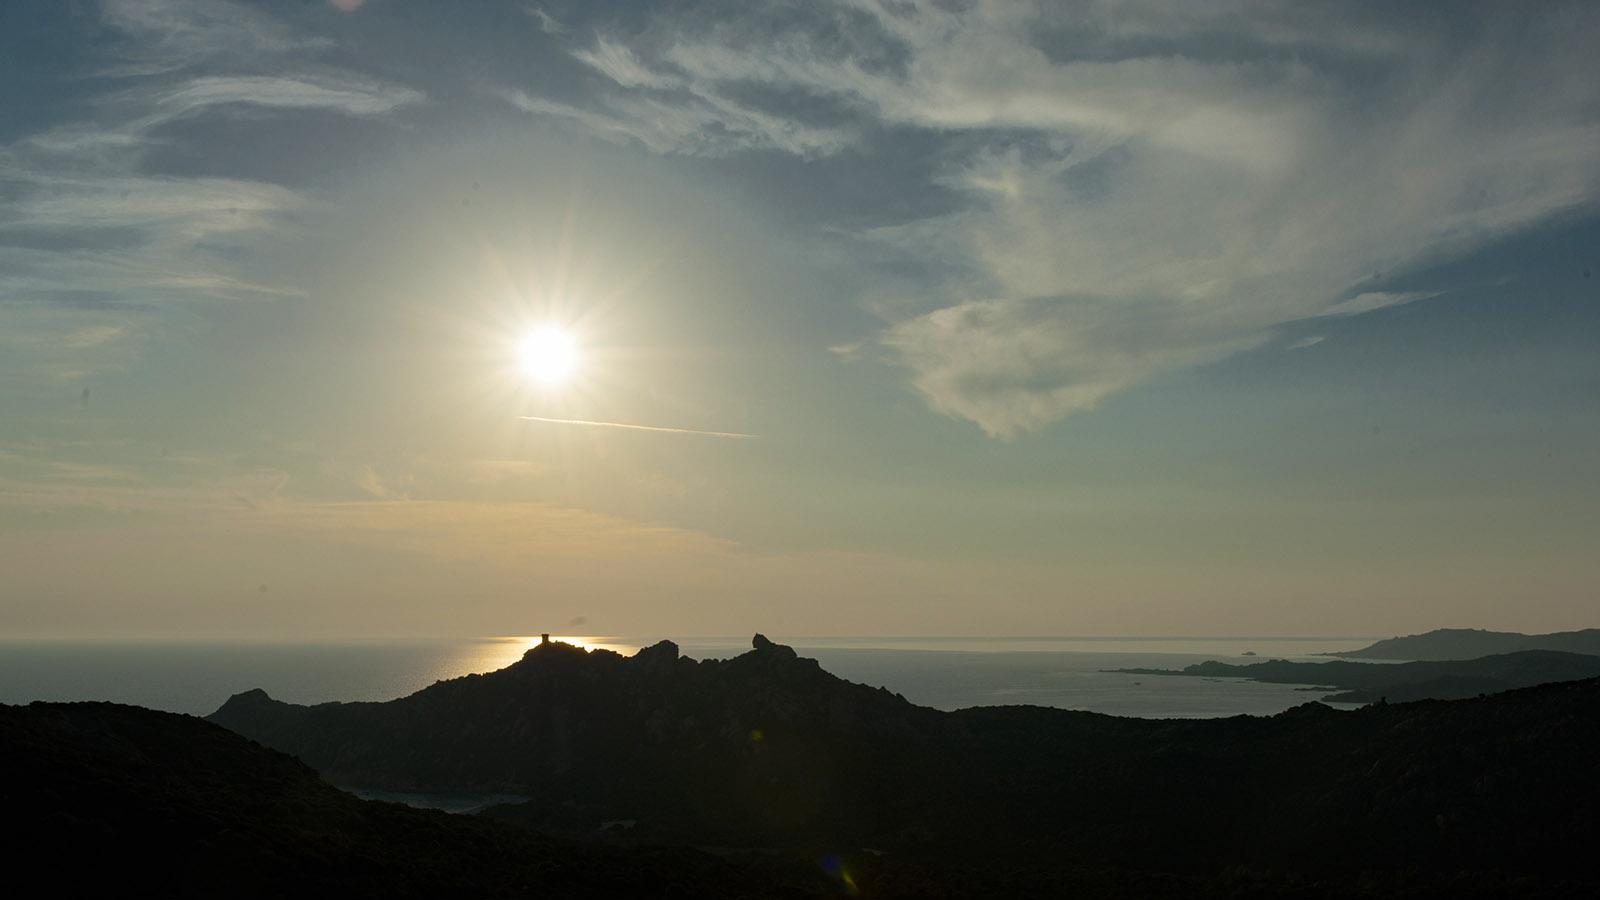 Sonnenuntergang am Genueserturm von Campomoro. Foto: Hilke Maunder